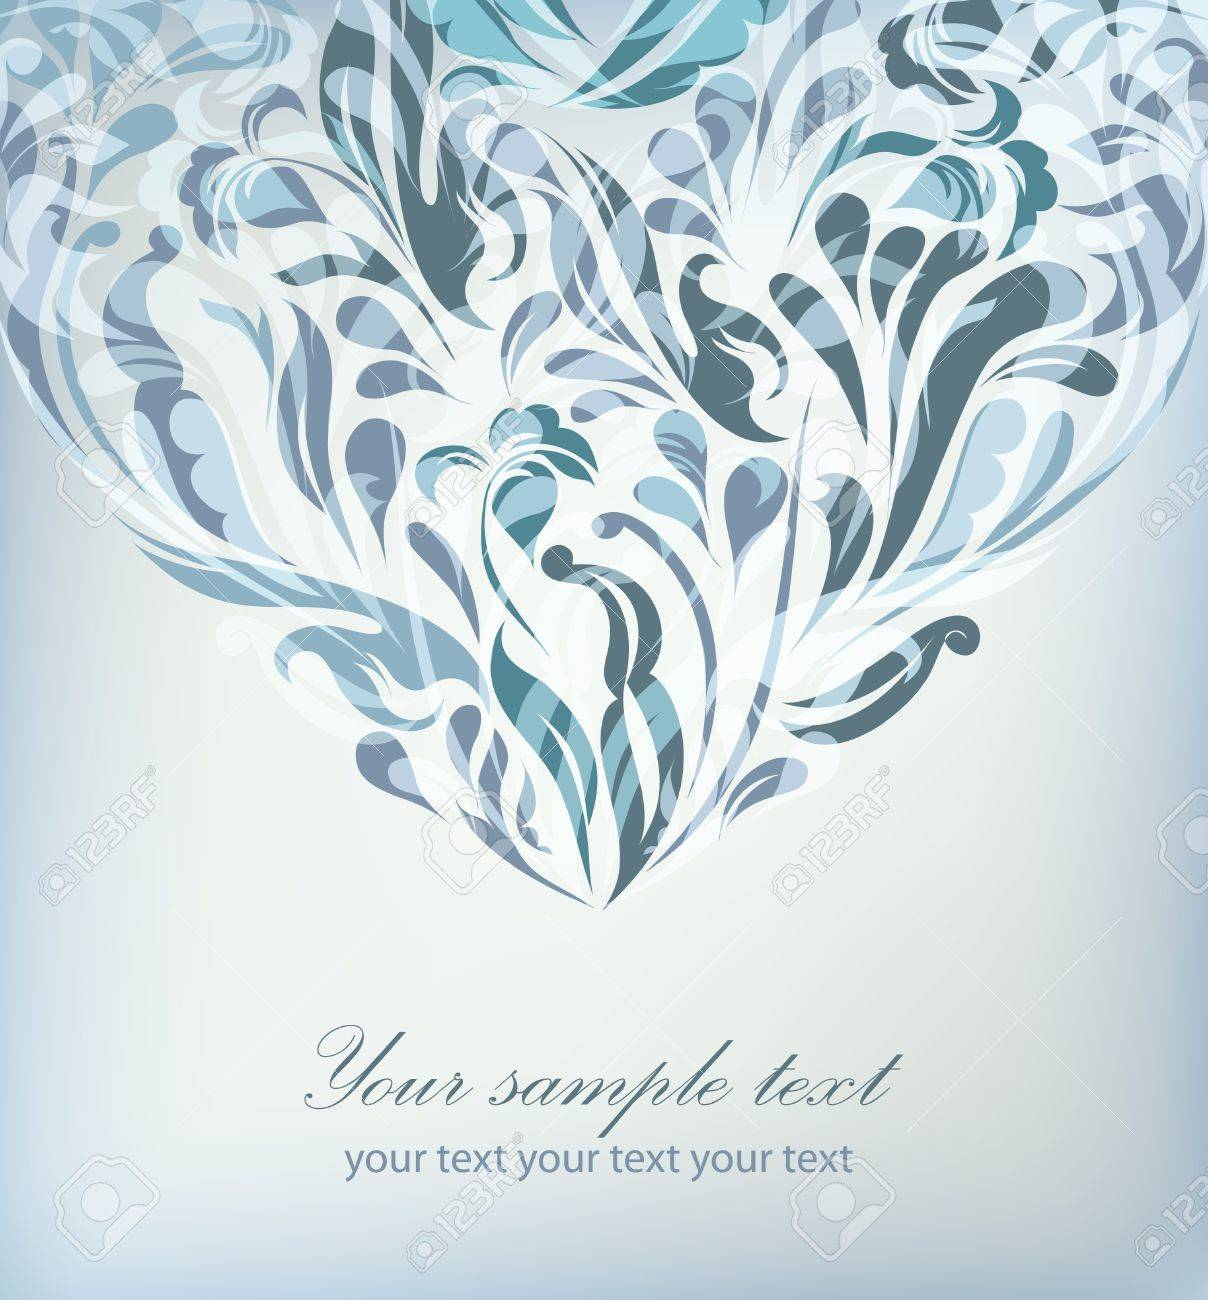 Resumen Fondo Azul Floral Con El Texto De La Tarjeta Invitacion - Fondo-invitacion-boda